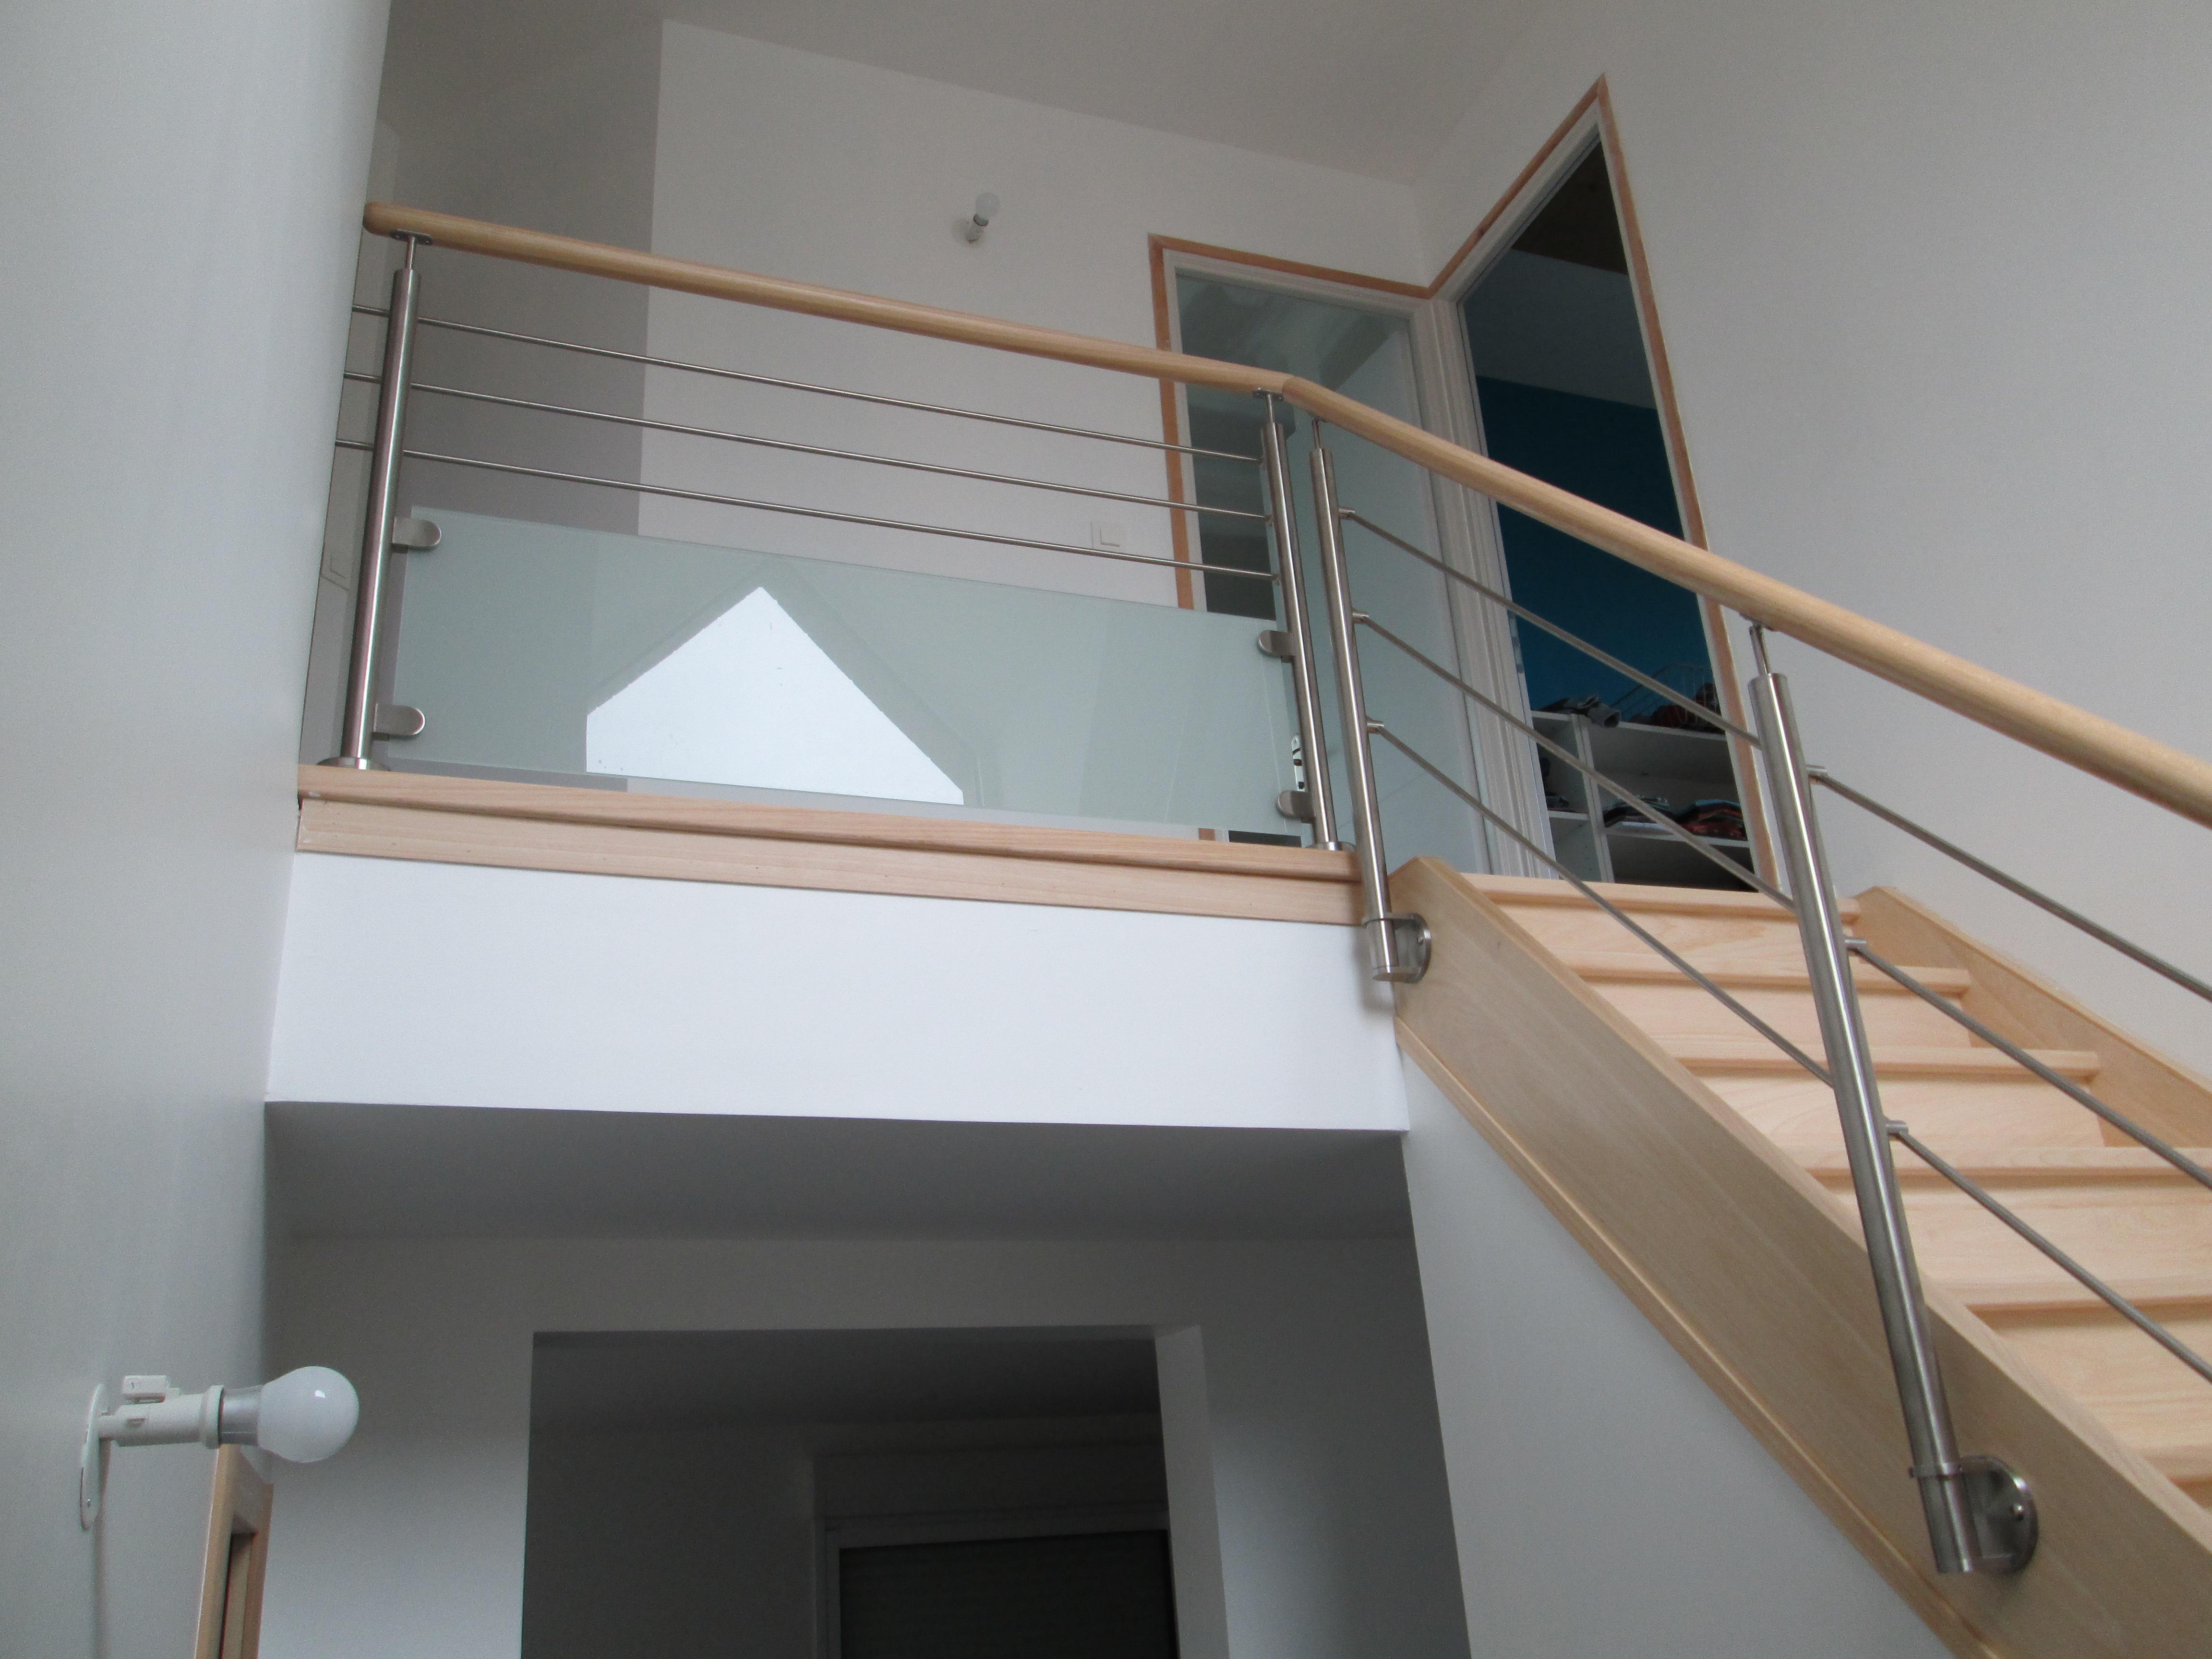 Garde De Corps Escalier pourquoi choisir un escalier avec des garde-corps en verre